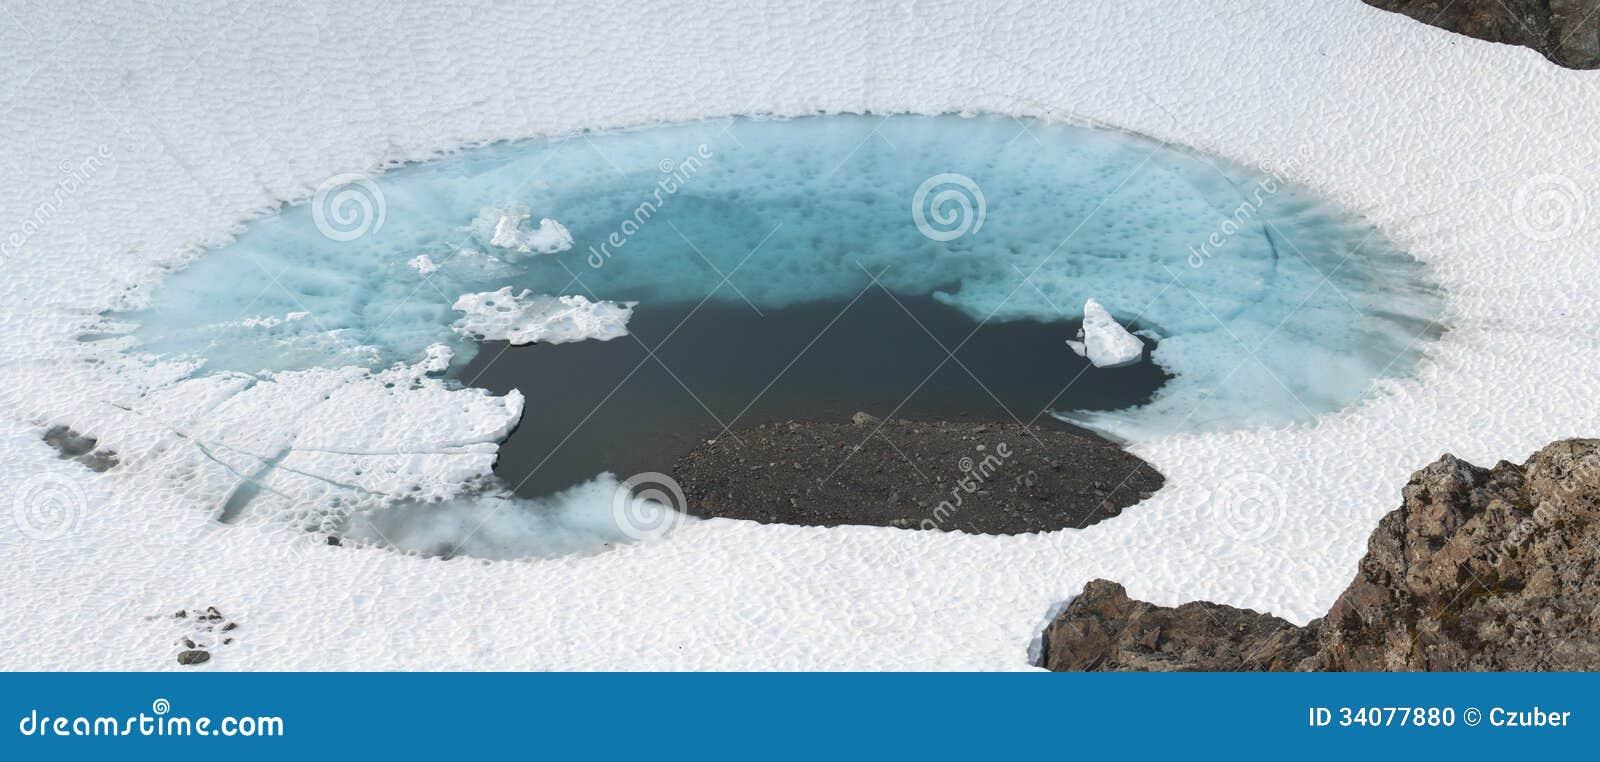 Glacial Pool Stock Photo Image 34077880